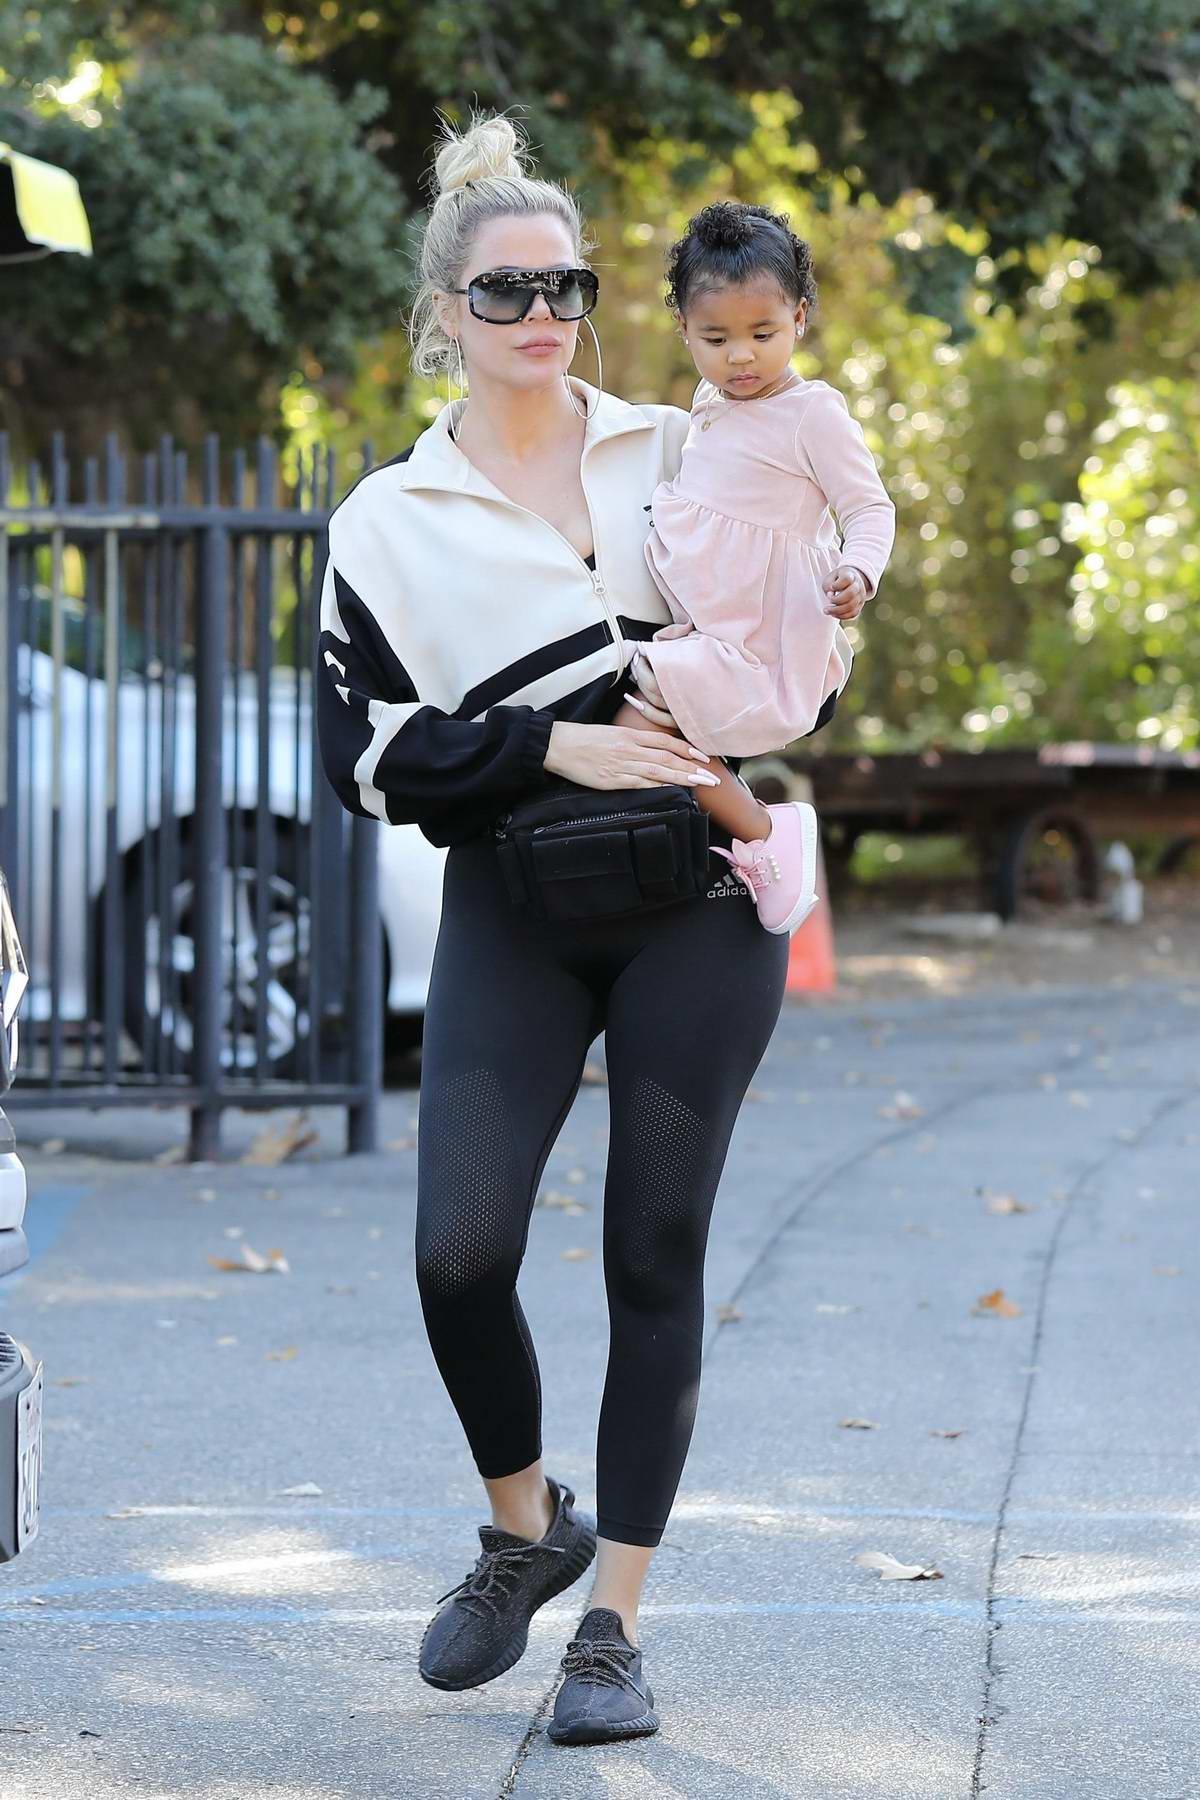 Khloe Kardashian takes her daughter to Farmers Market in Calabasas, California